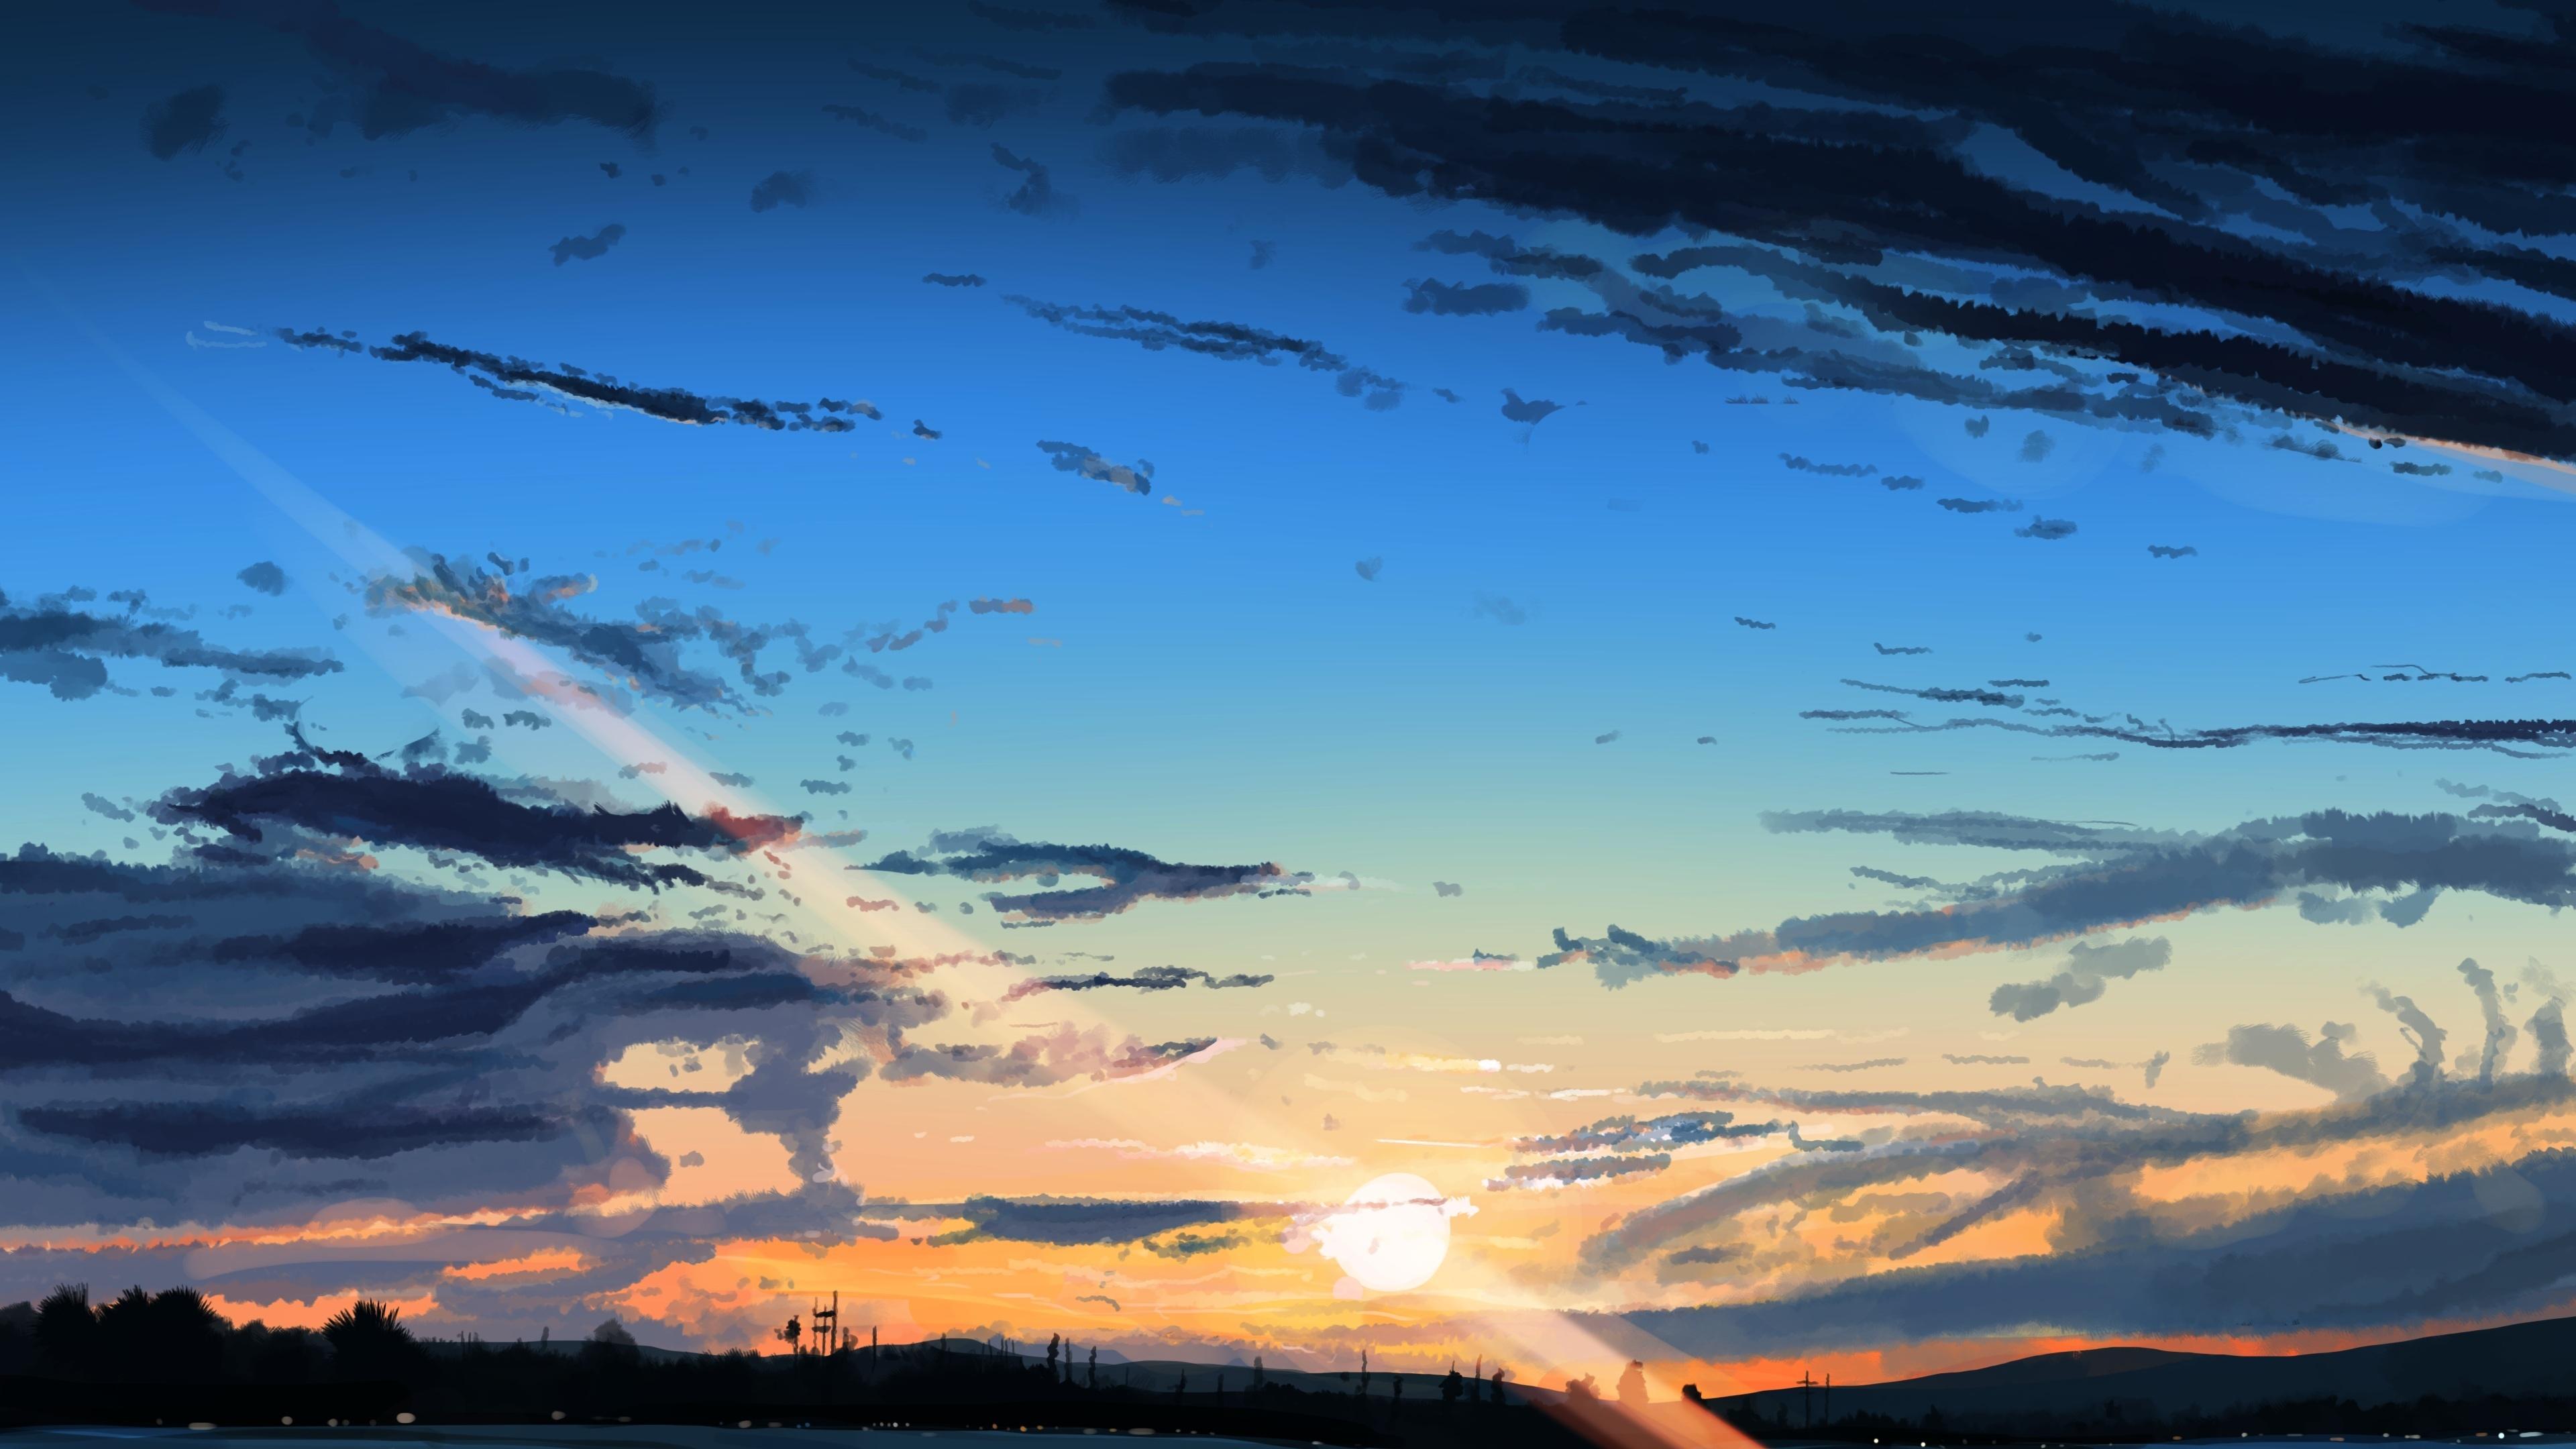 Anime Landscape Wallpaper 4k Materi Pelajaran 8